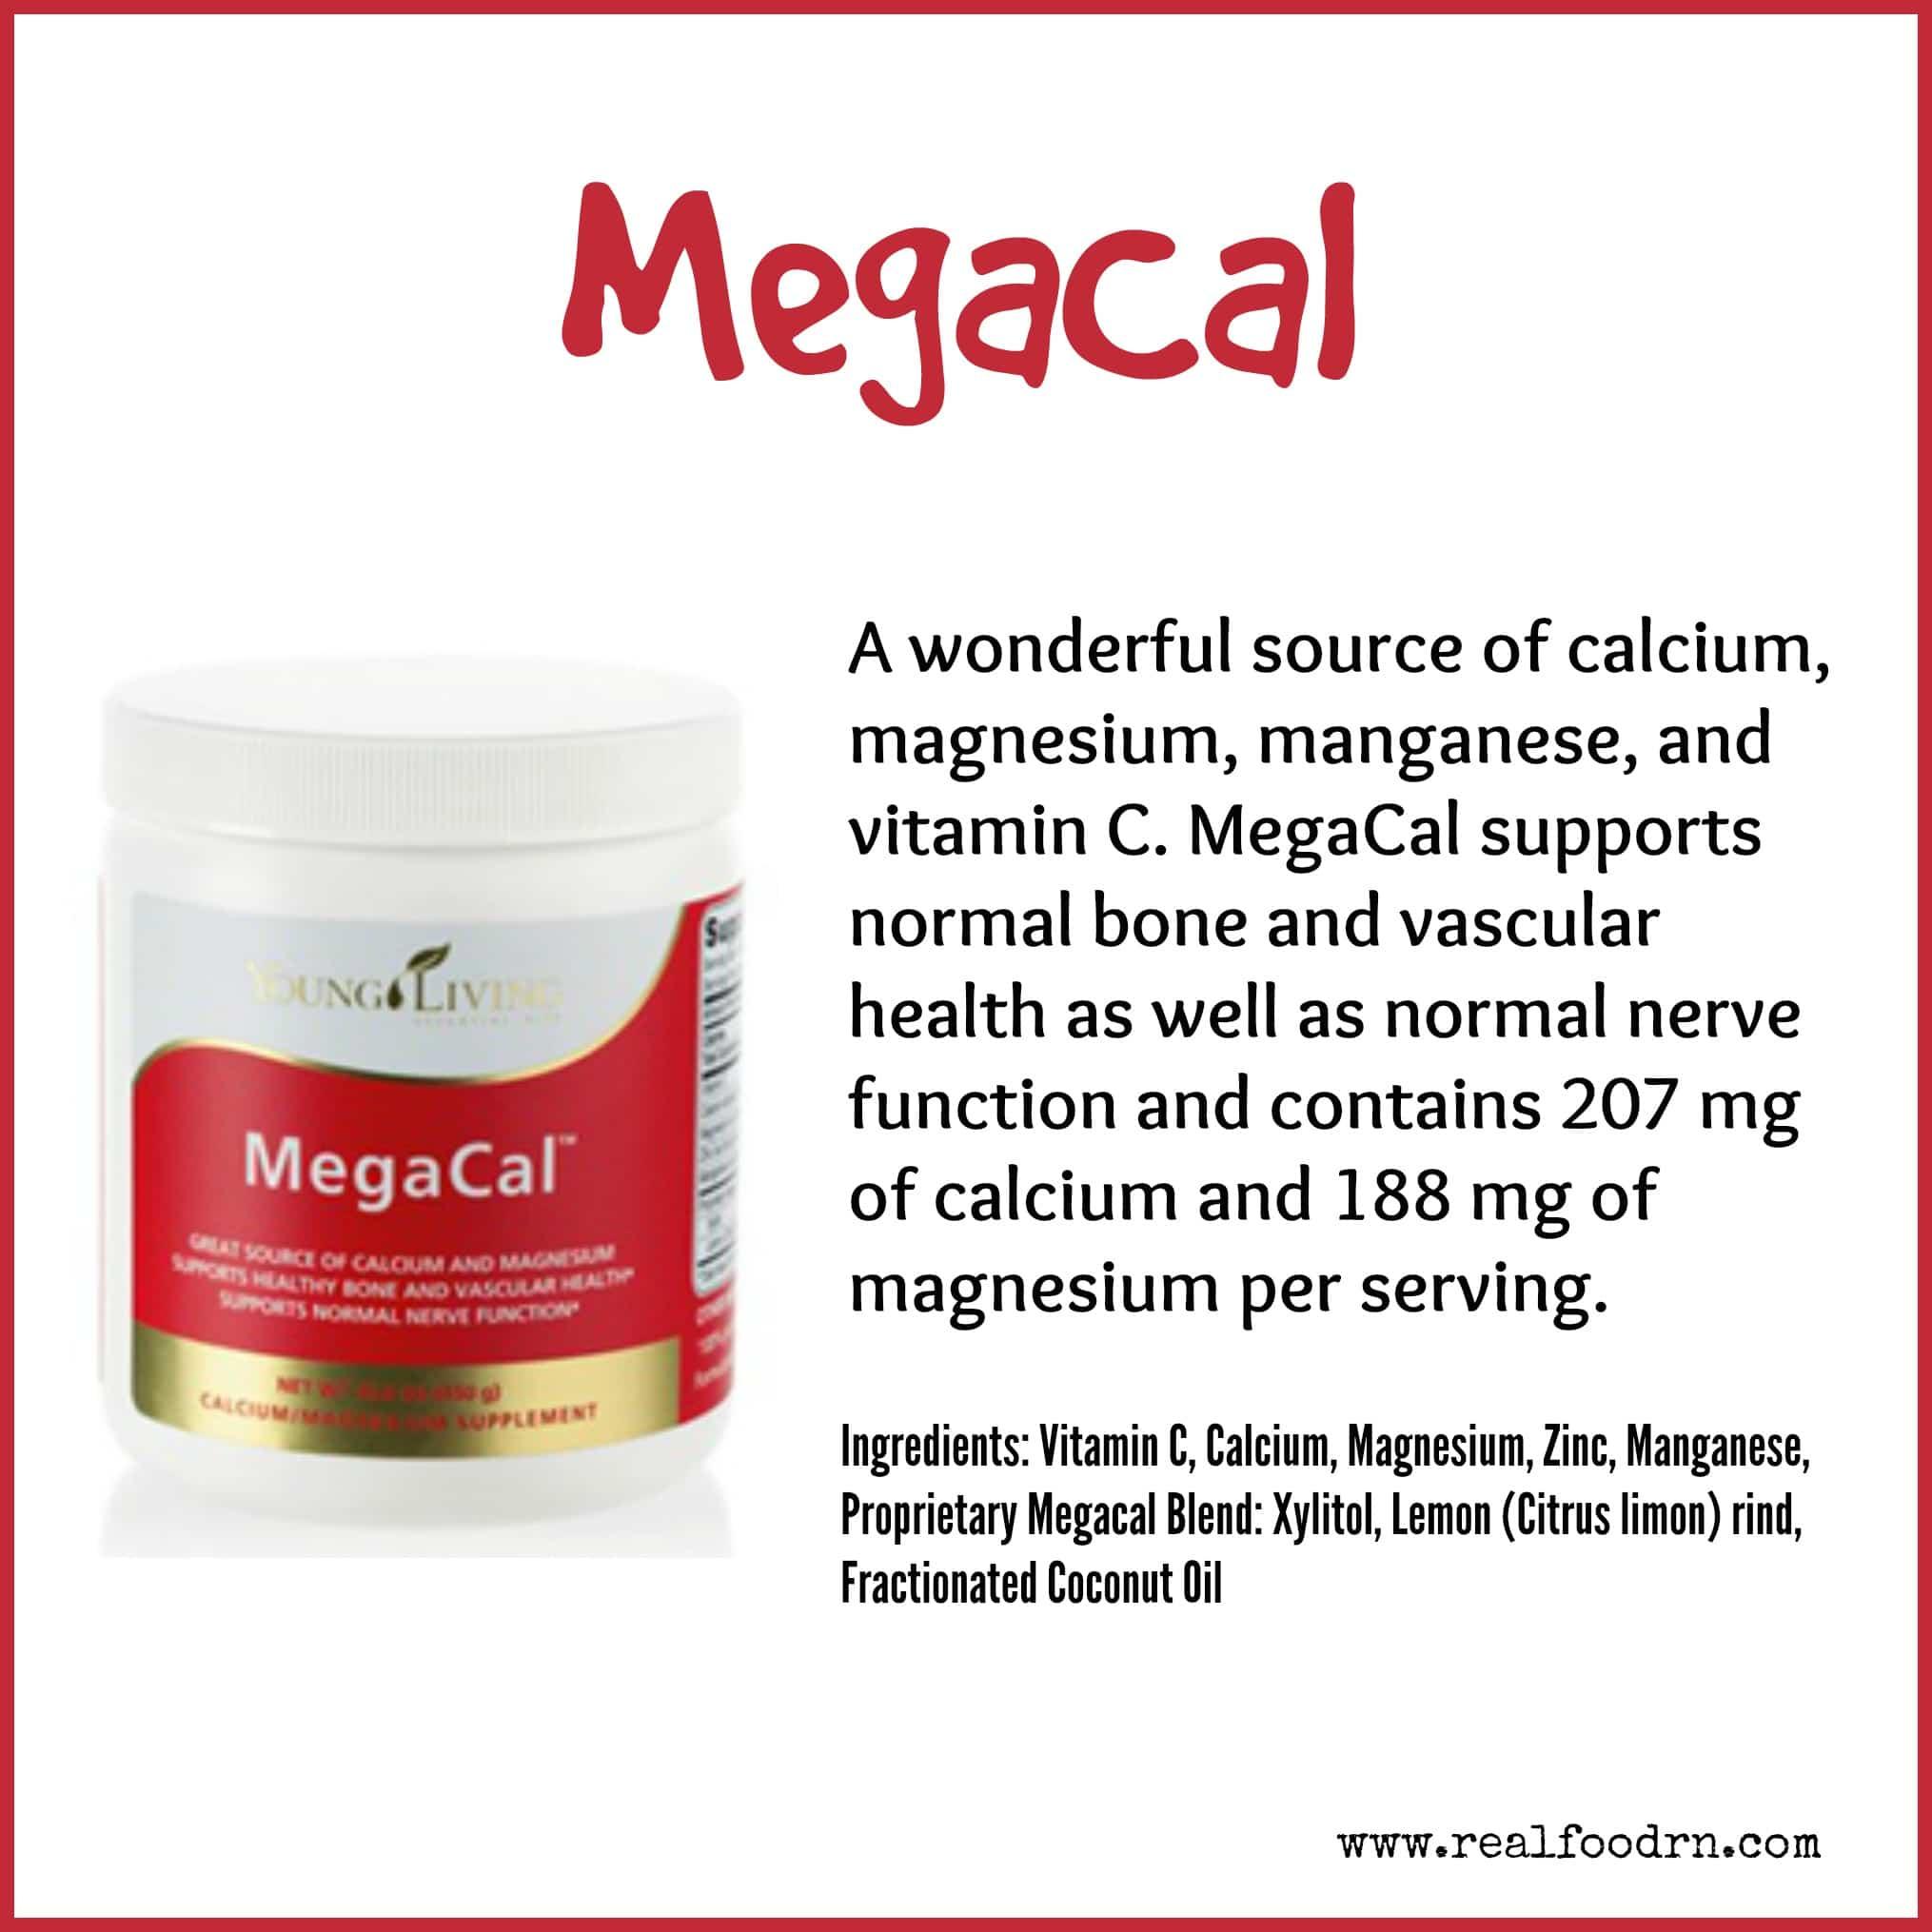 MegaCal